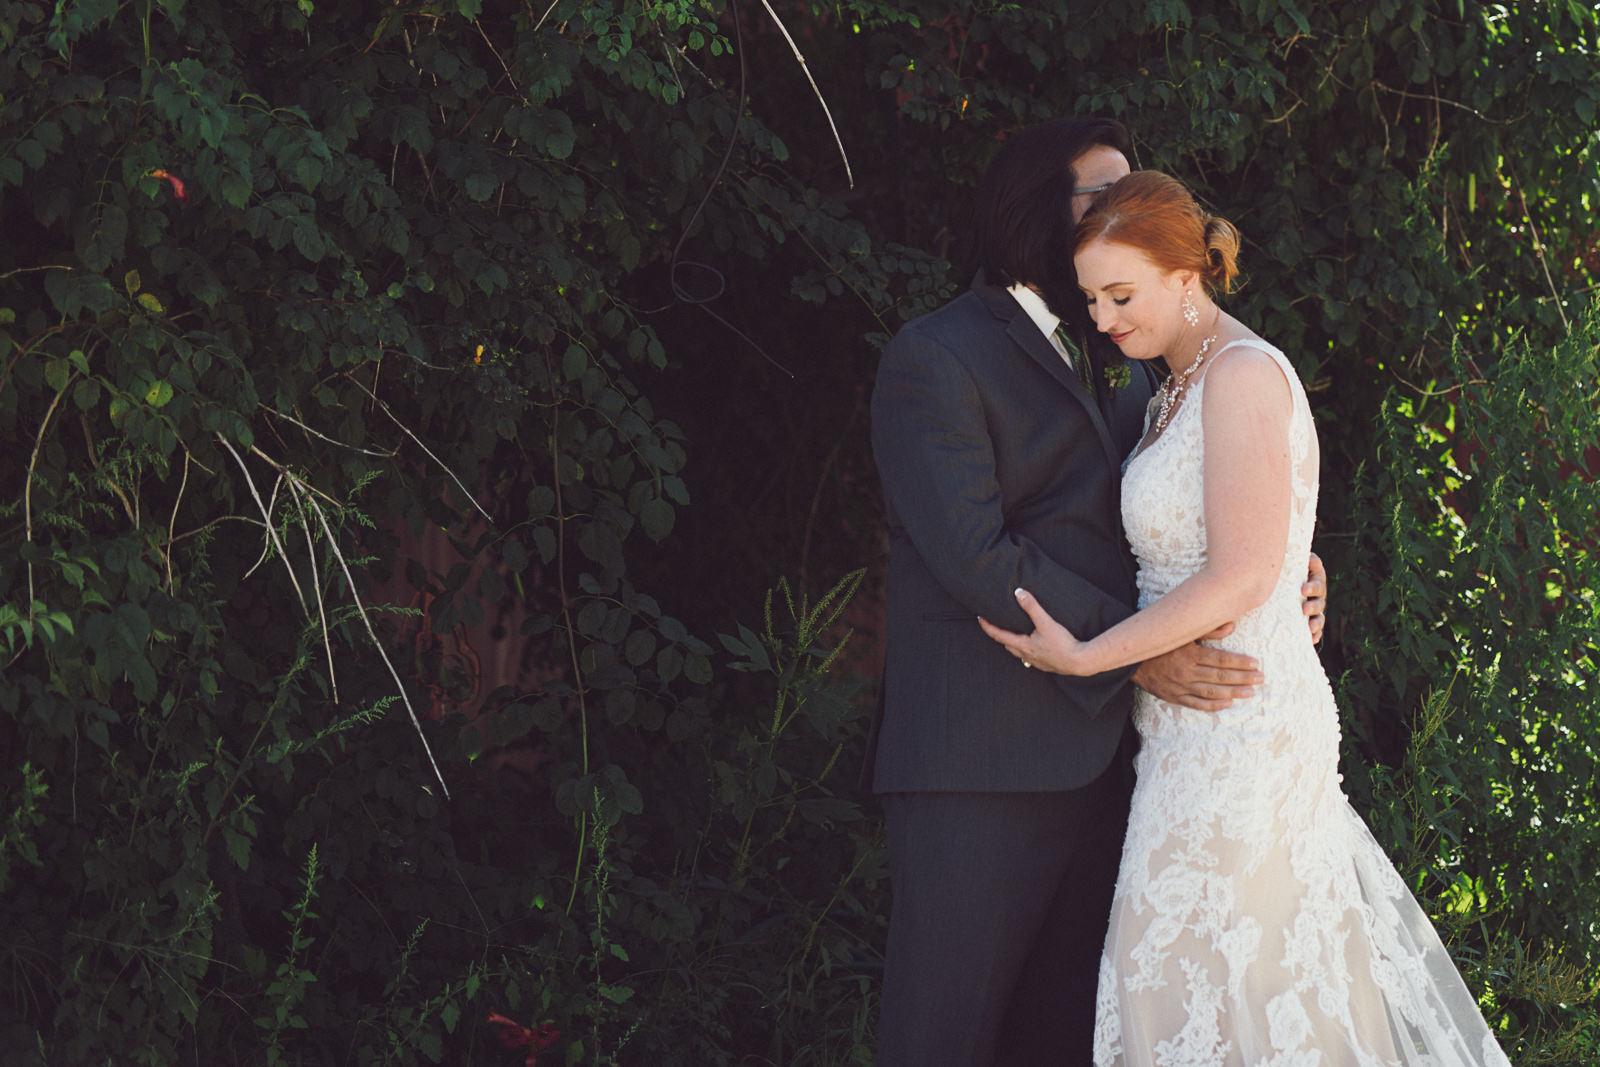 wedding-keely-caleb-469-name-your-photo.jpg